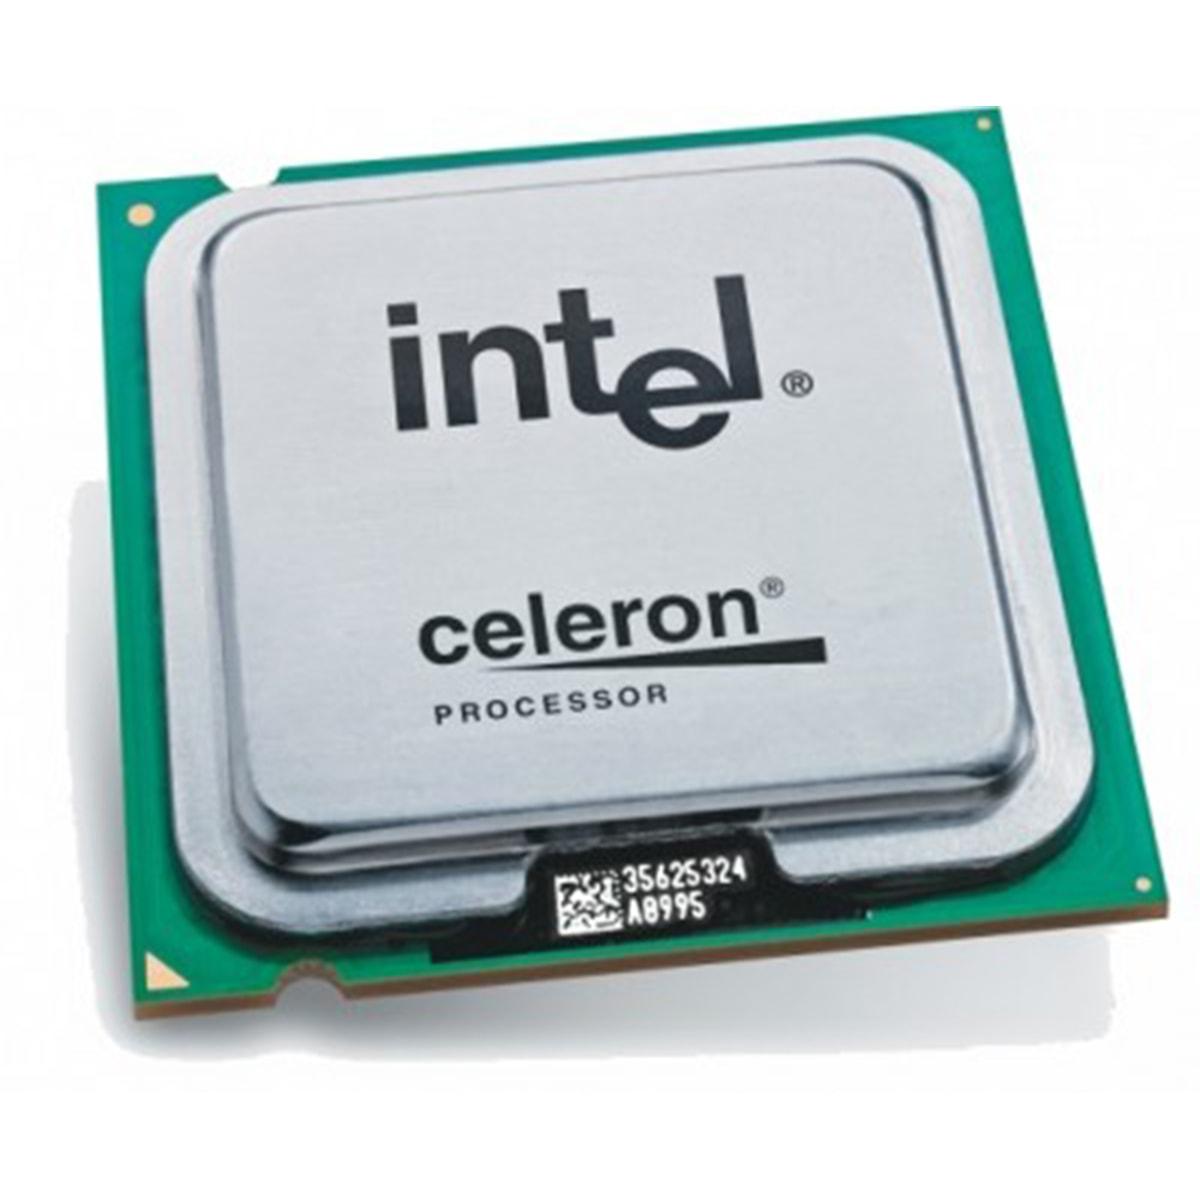 Processador Intel Celeron 440 2,00Ghz 512Kb Cache 800MHz - Socket 775 - Seminovo